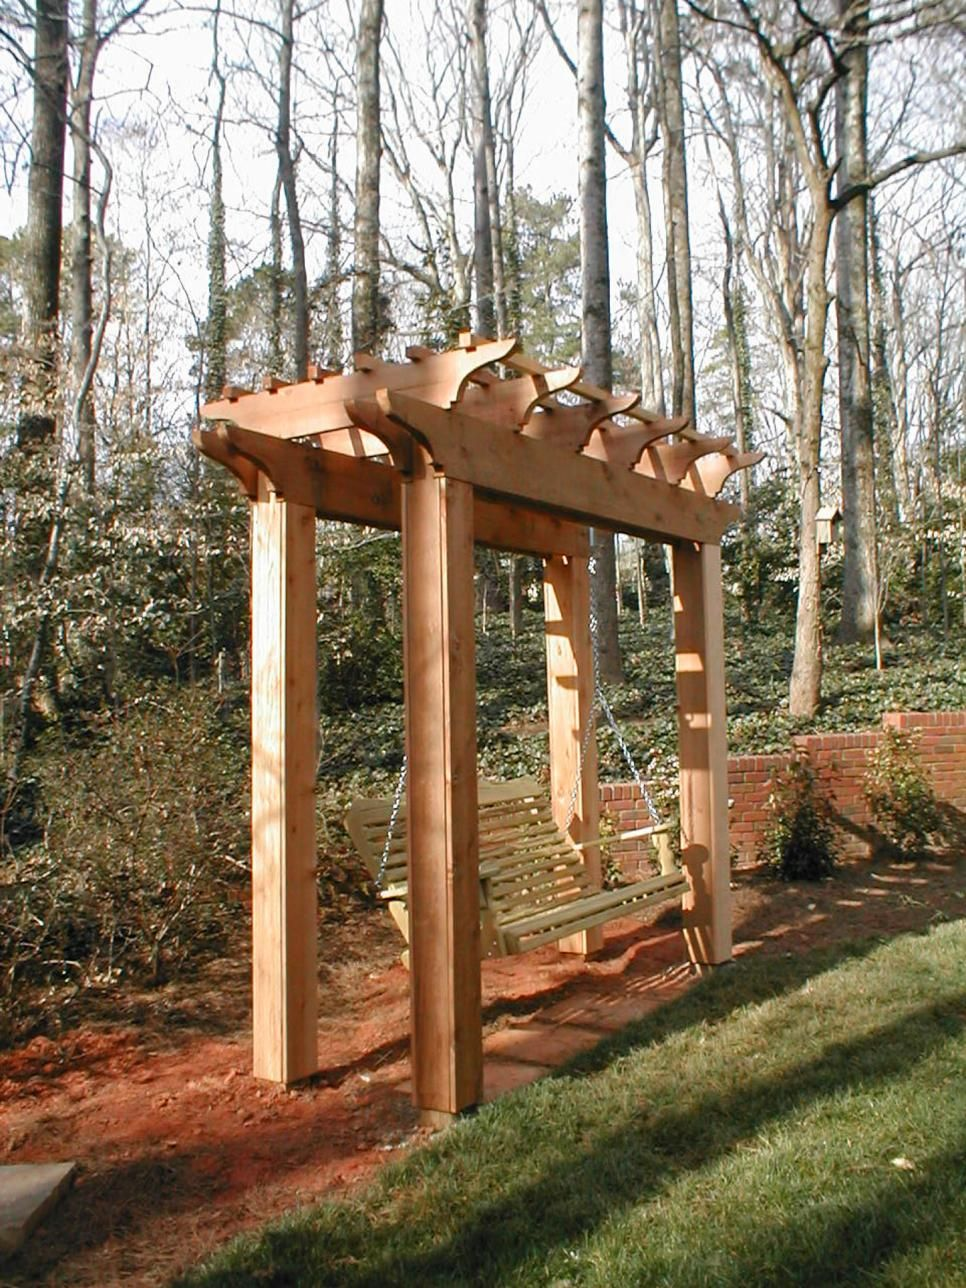 Garden swing design ideas homestead jardines columpios pérgolas